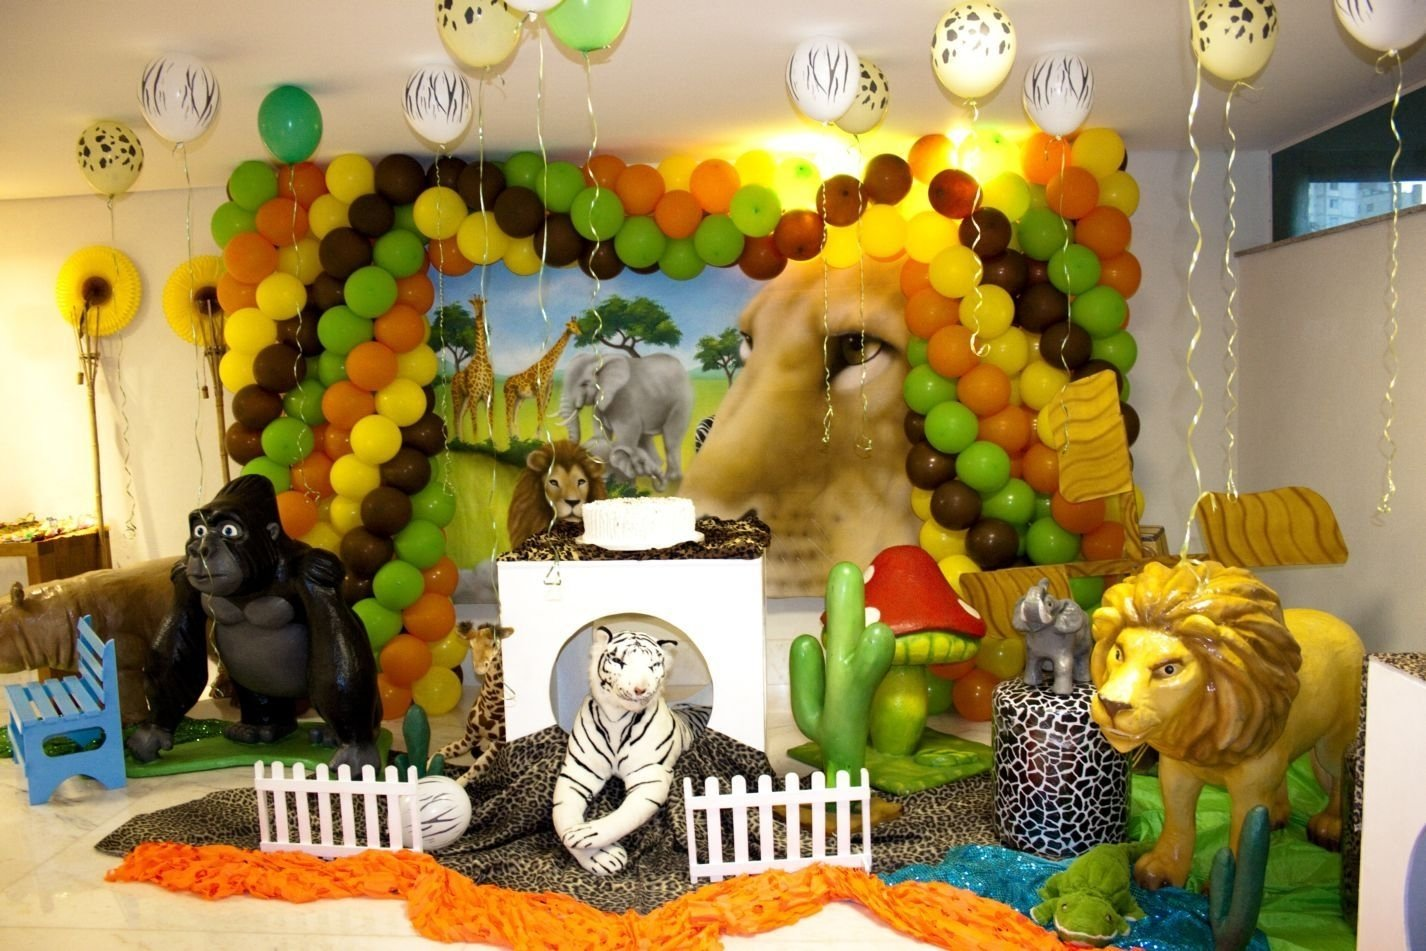 10 Spectacular Animal Themed Birthday Party Ideas animal props at jungle theme party jungle theme party pinterest